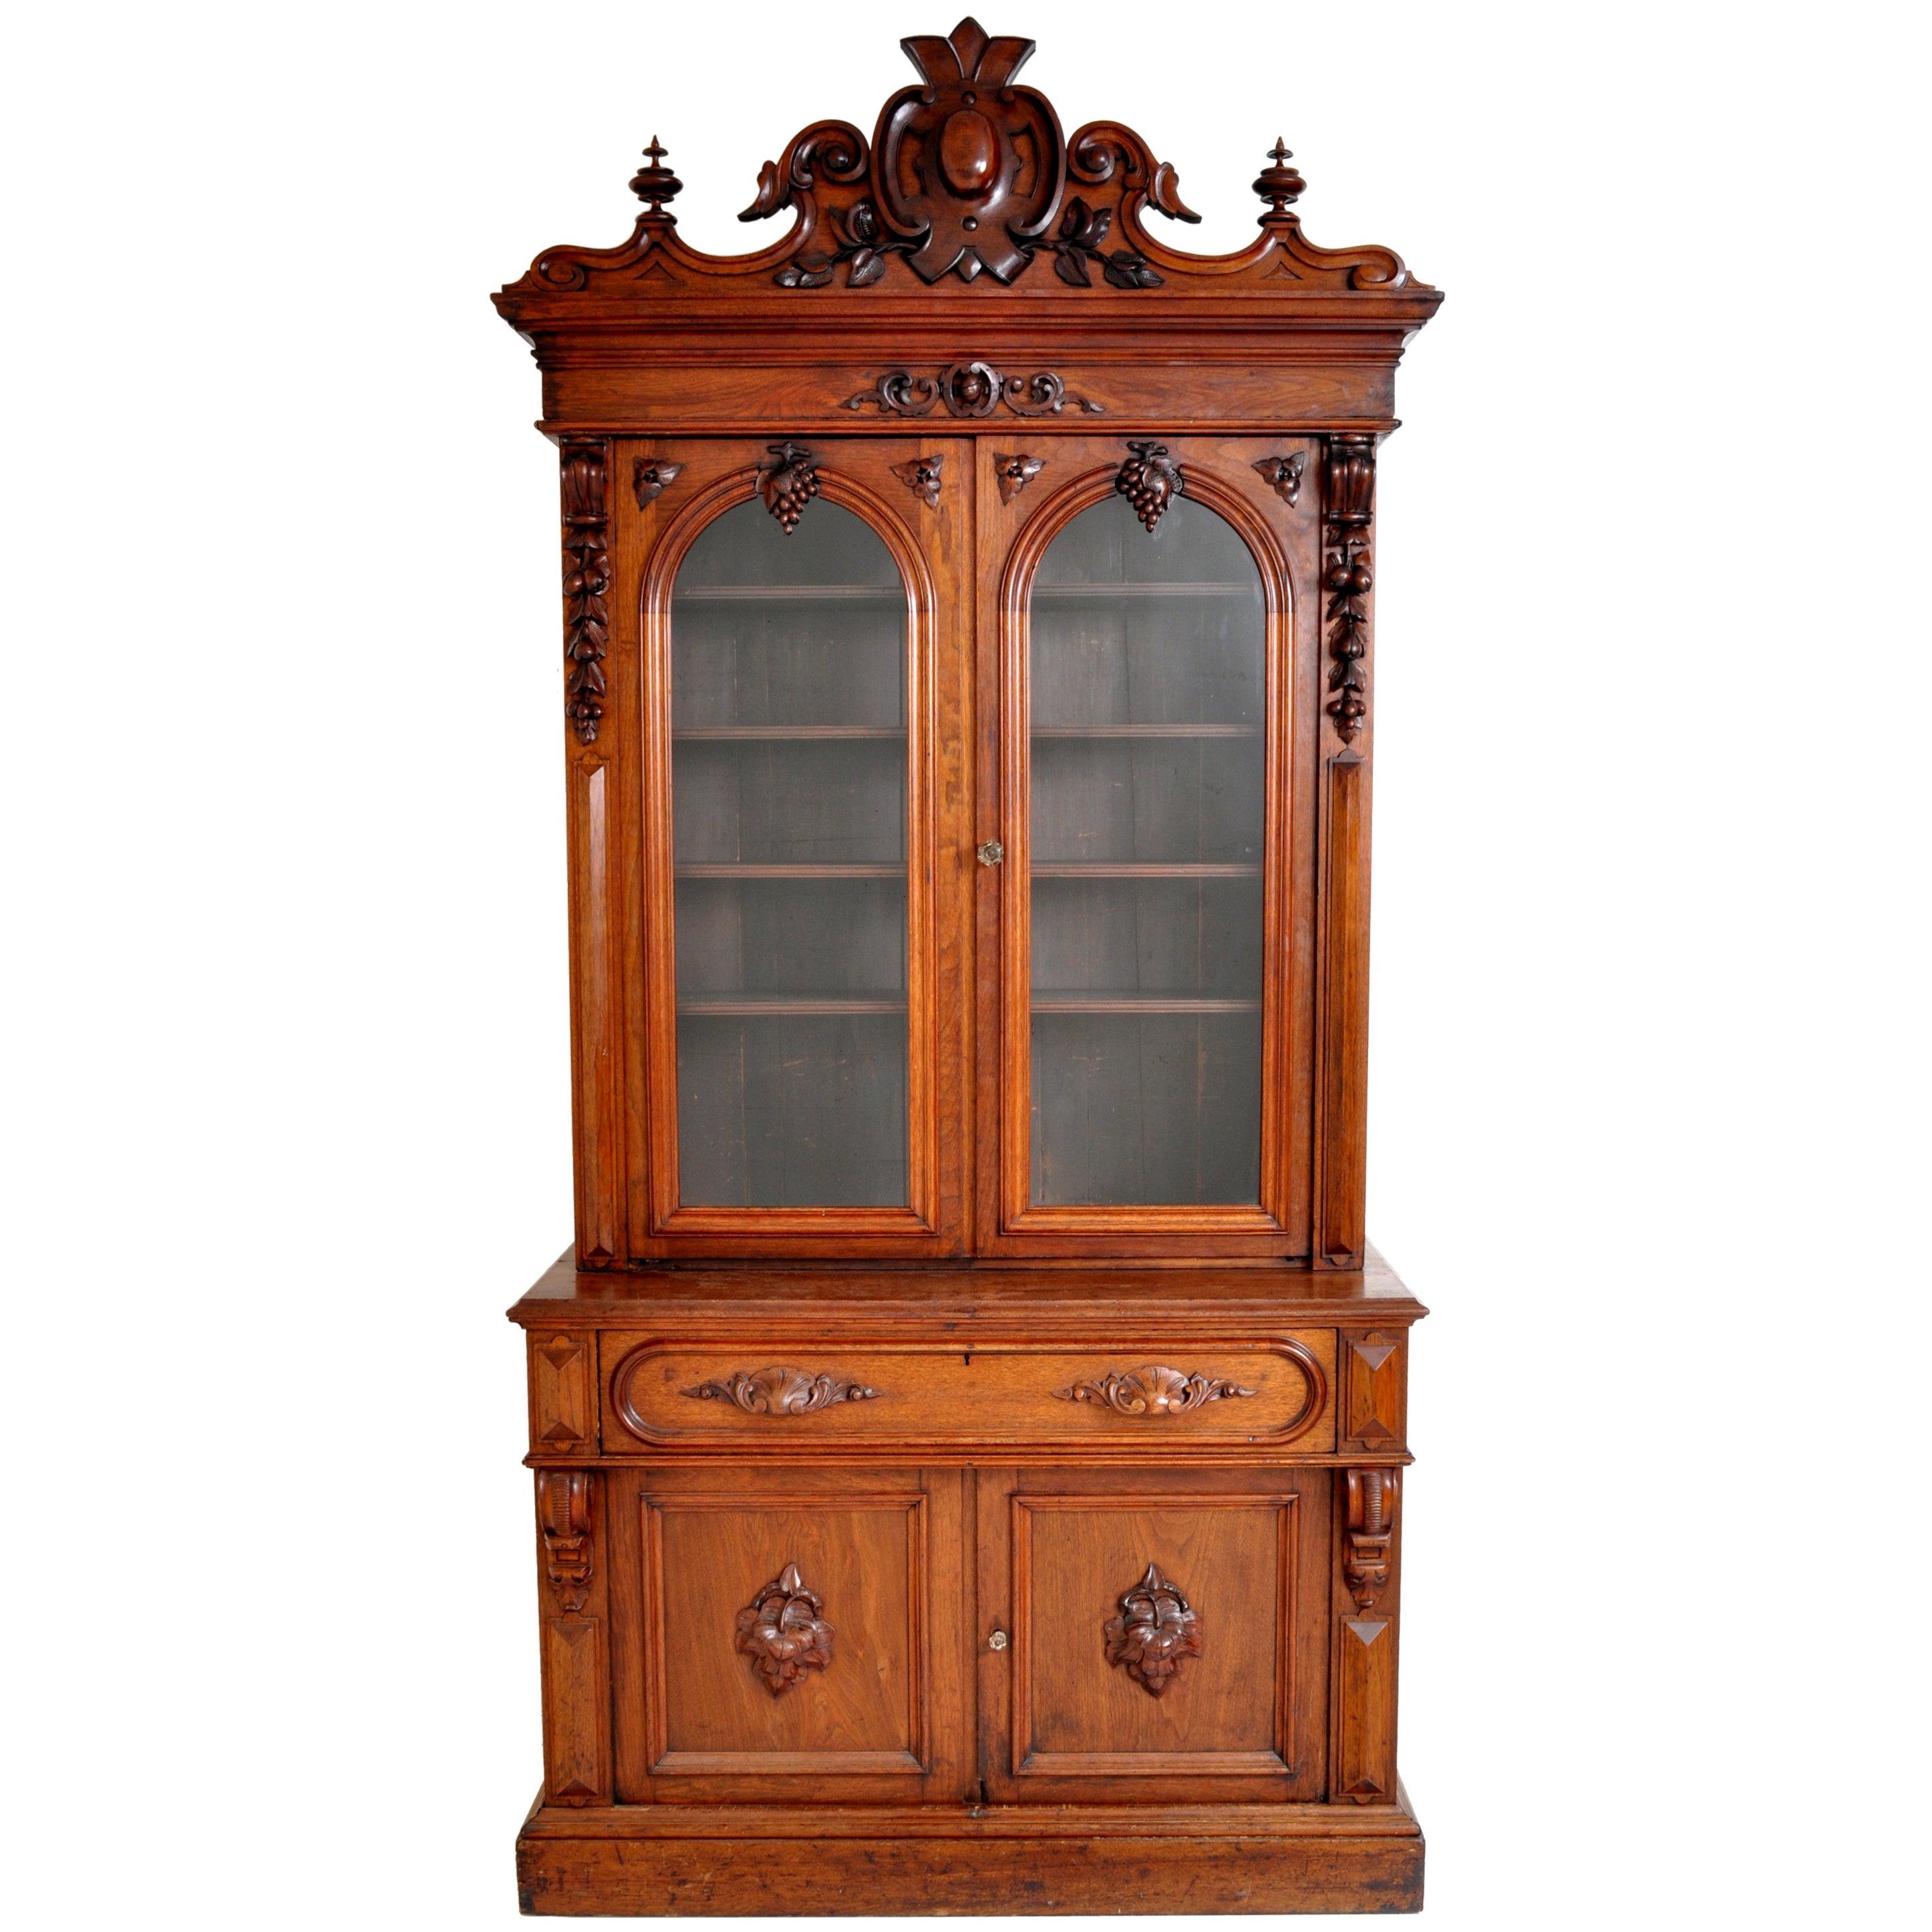 Antique American Renaissance Revival Carved Walnut Secretary Desk Bookcase, 1870